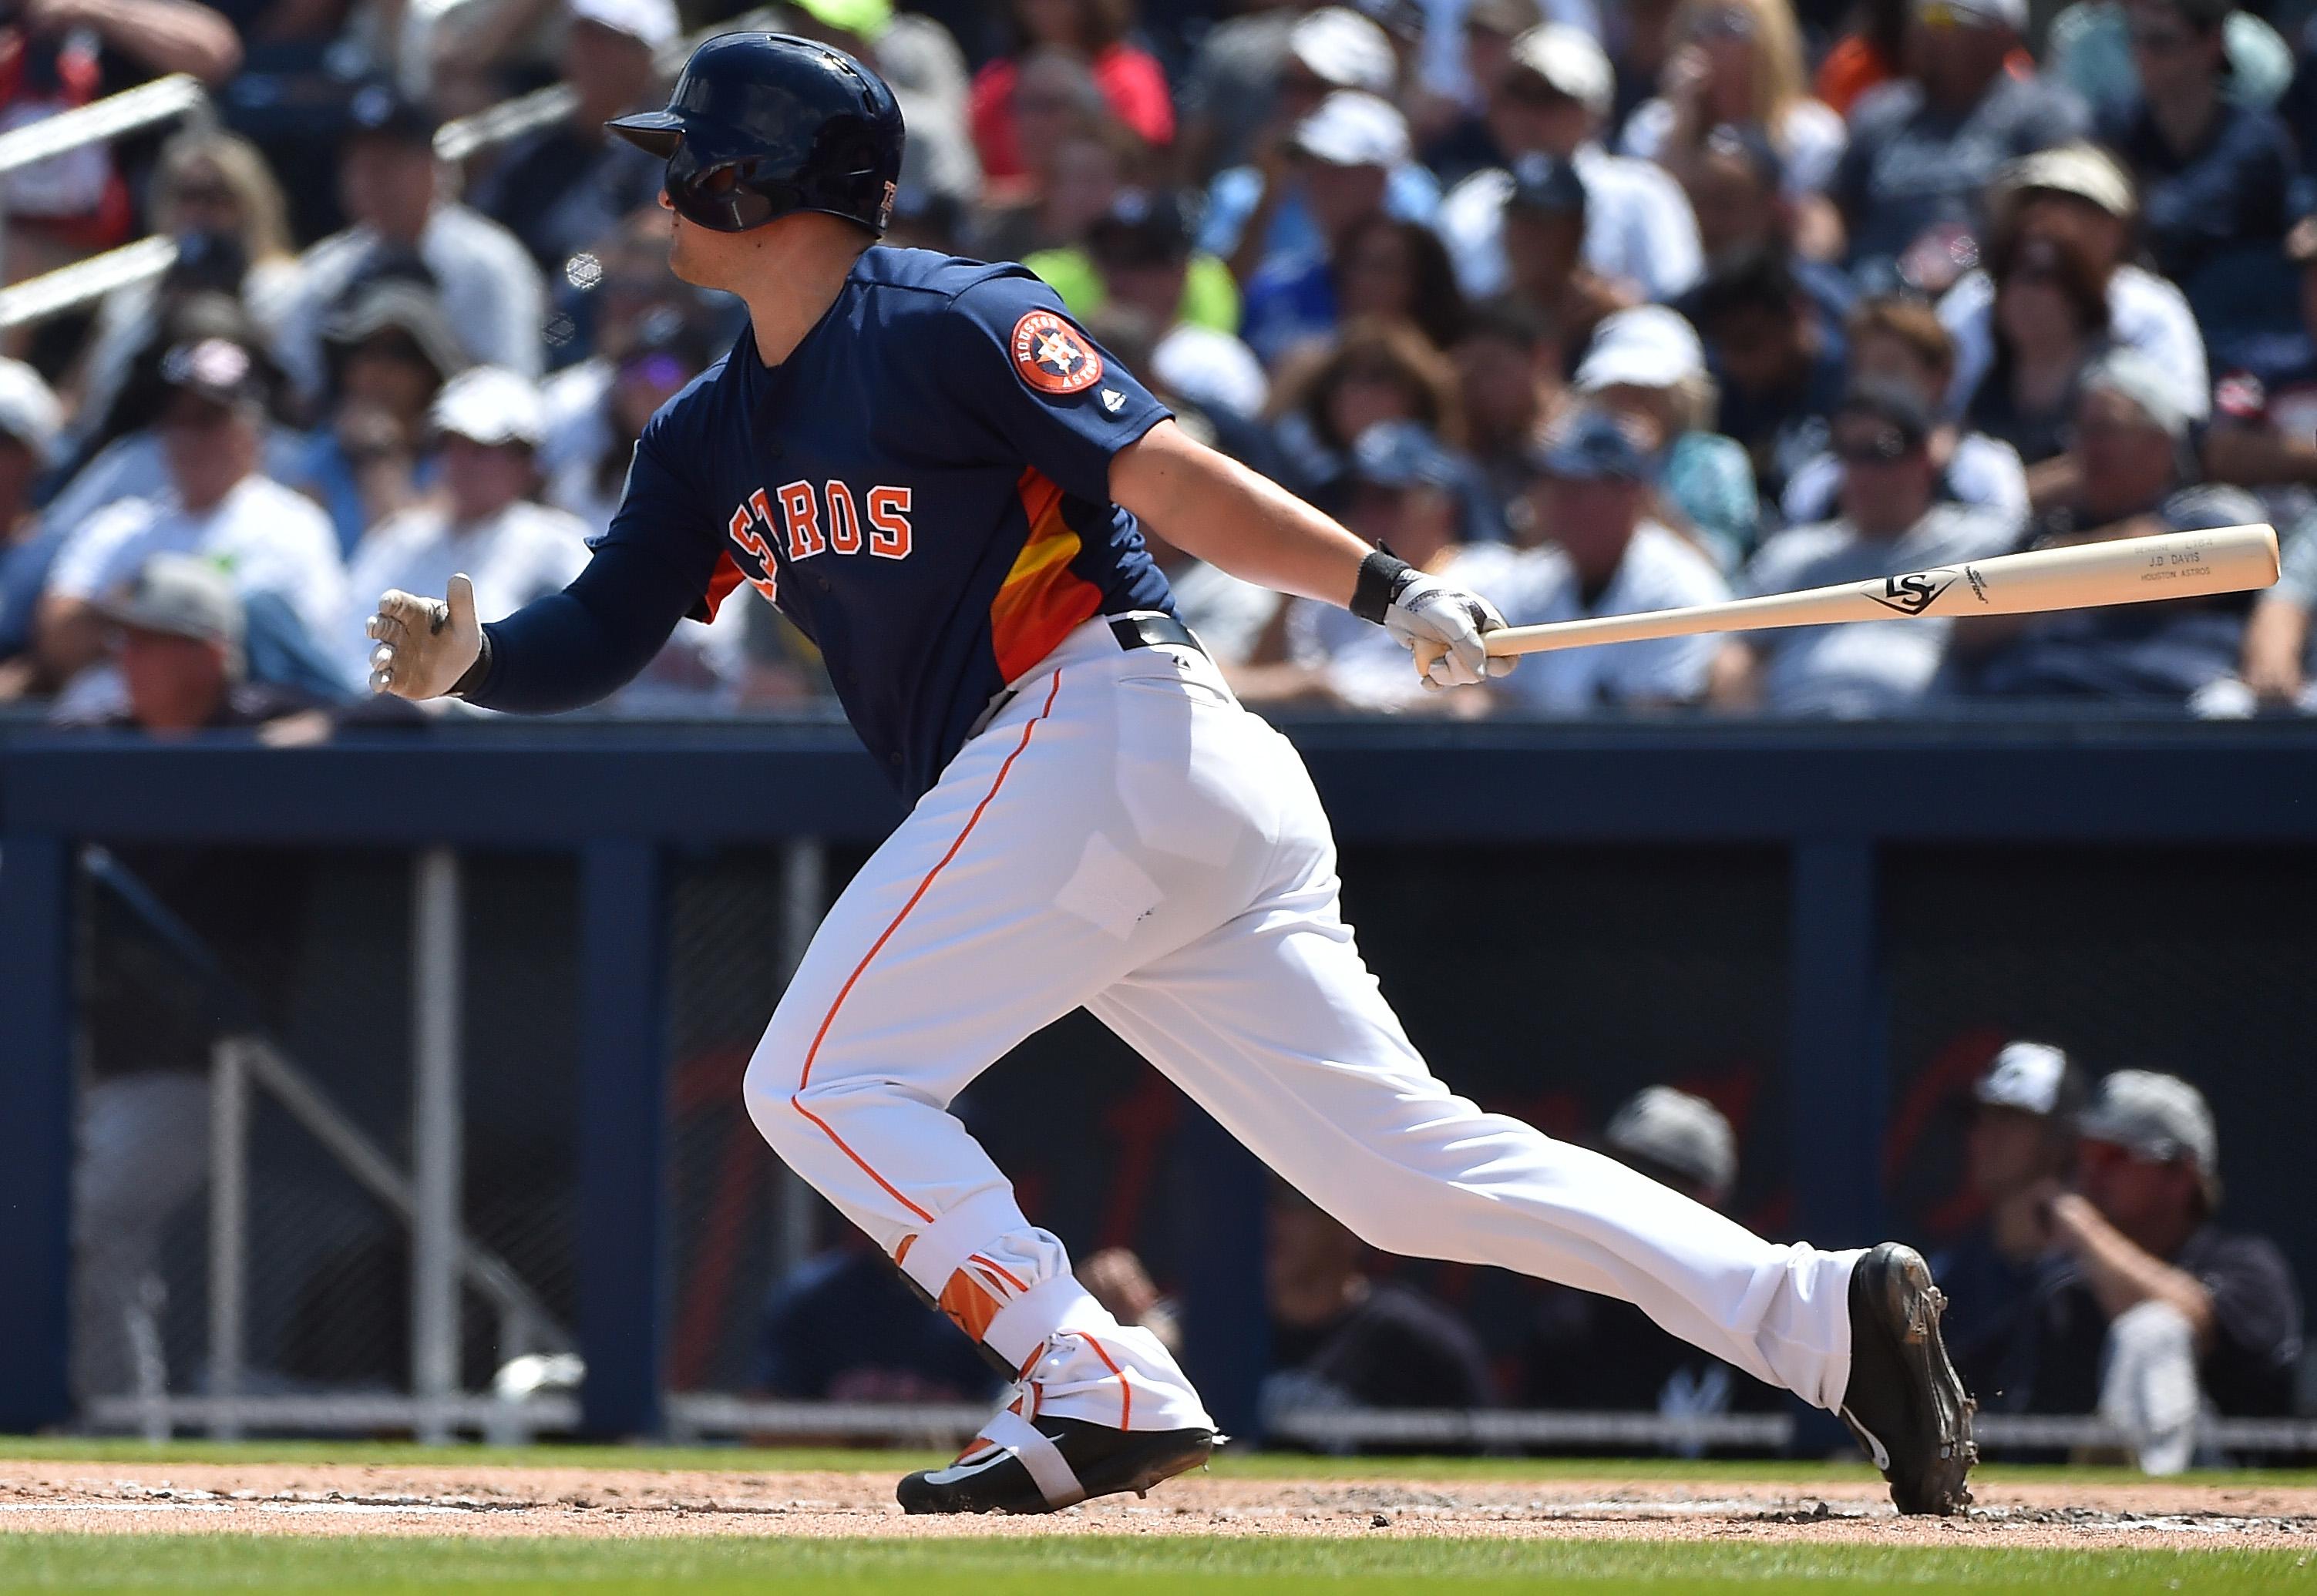 MLB: Spring Training-New York Yankees at Houston Astros